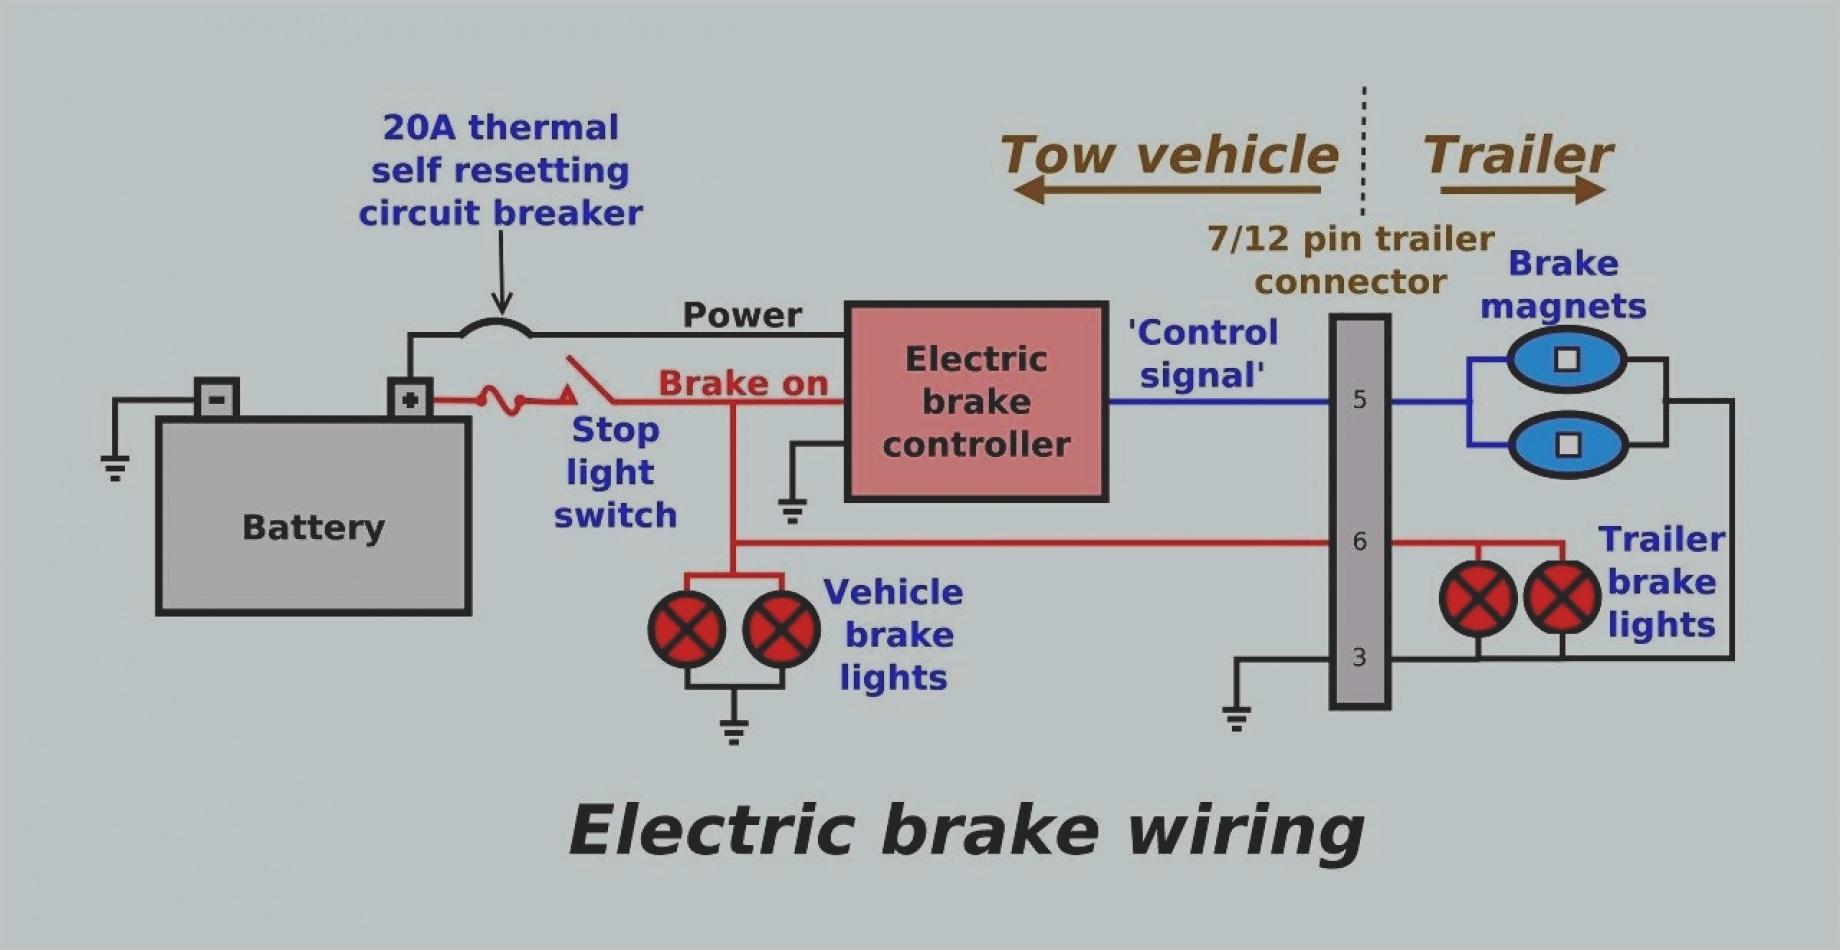 hight resolution of trailer breakaway wiring schematic 17 wiring diagram for brake controller pic good looking tekonsha p3